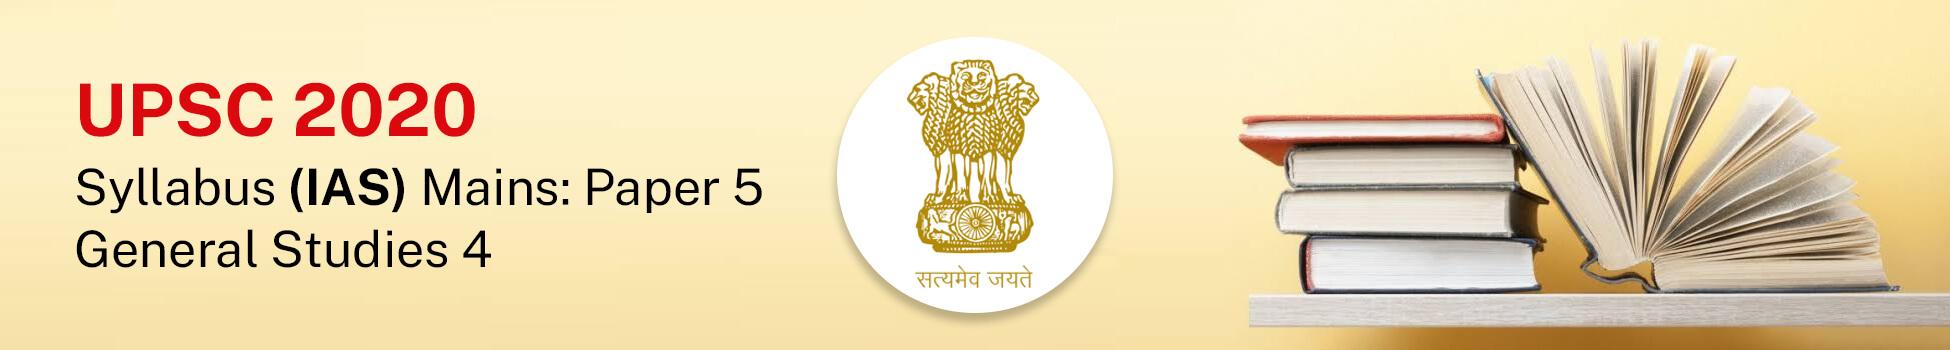 UPSC CSE Mains Syllabus: Paper 5 – General Studies 4